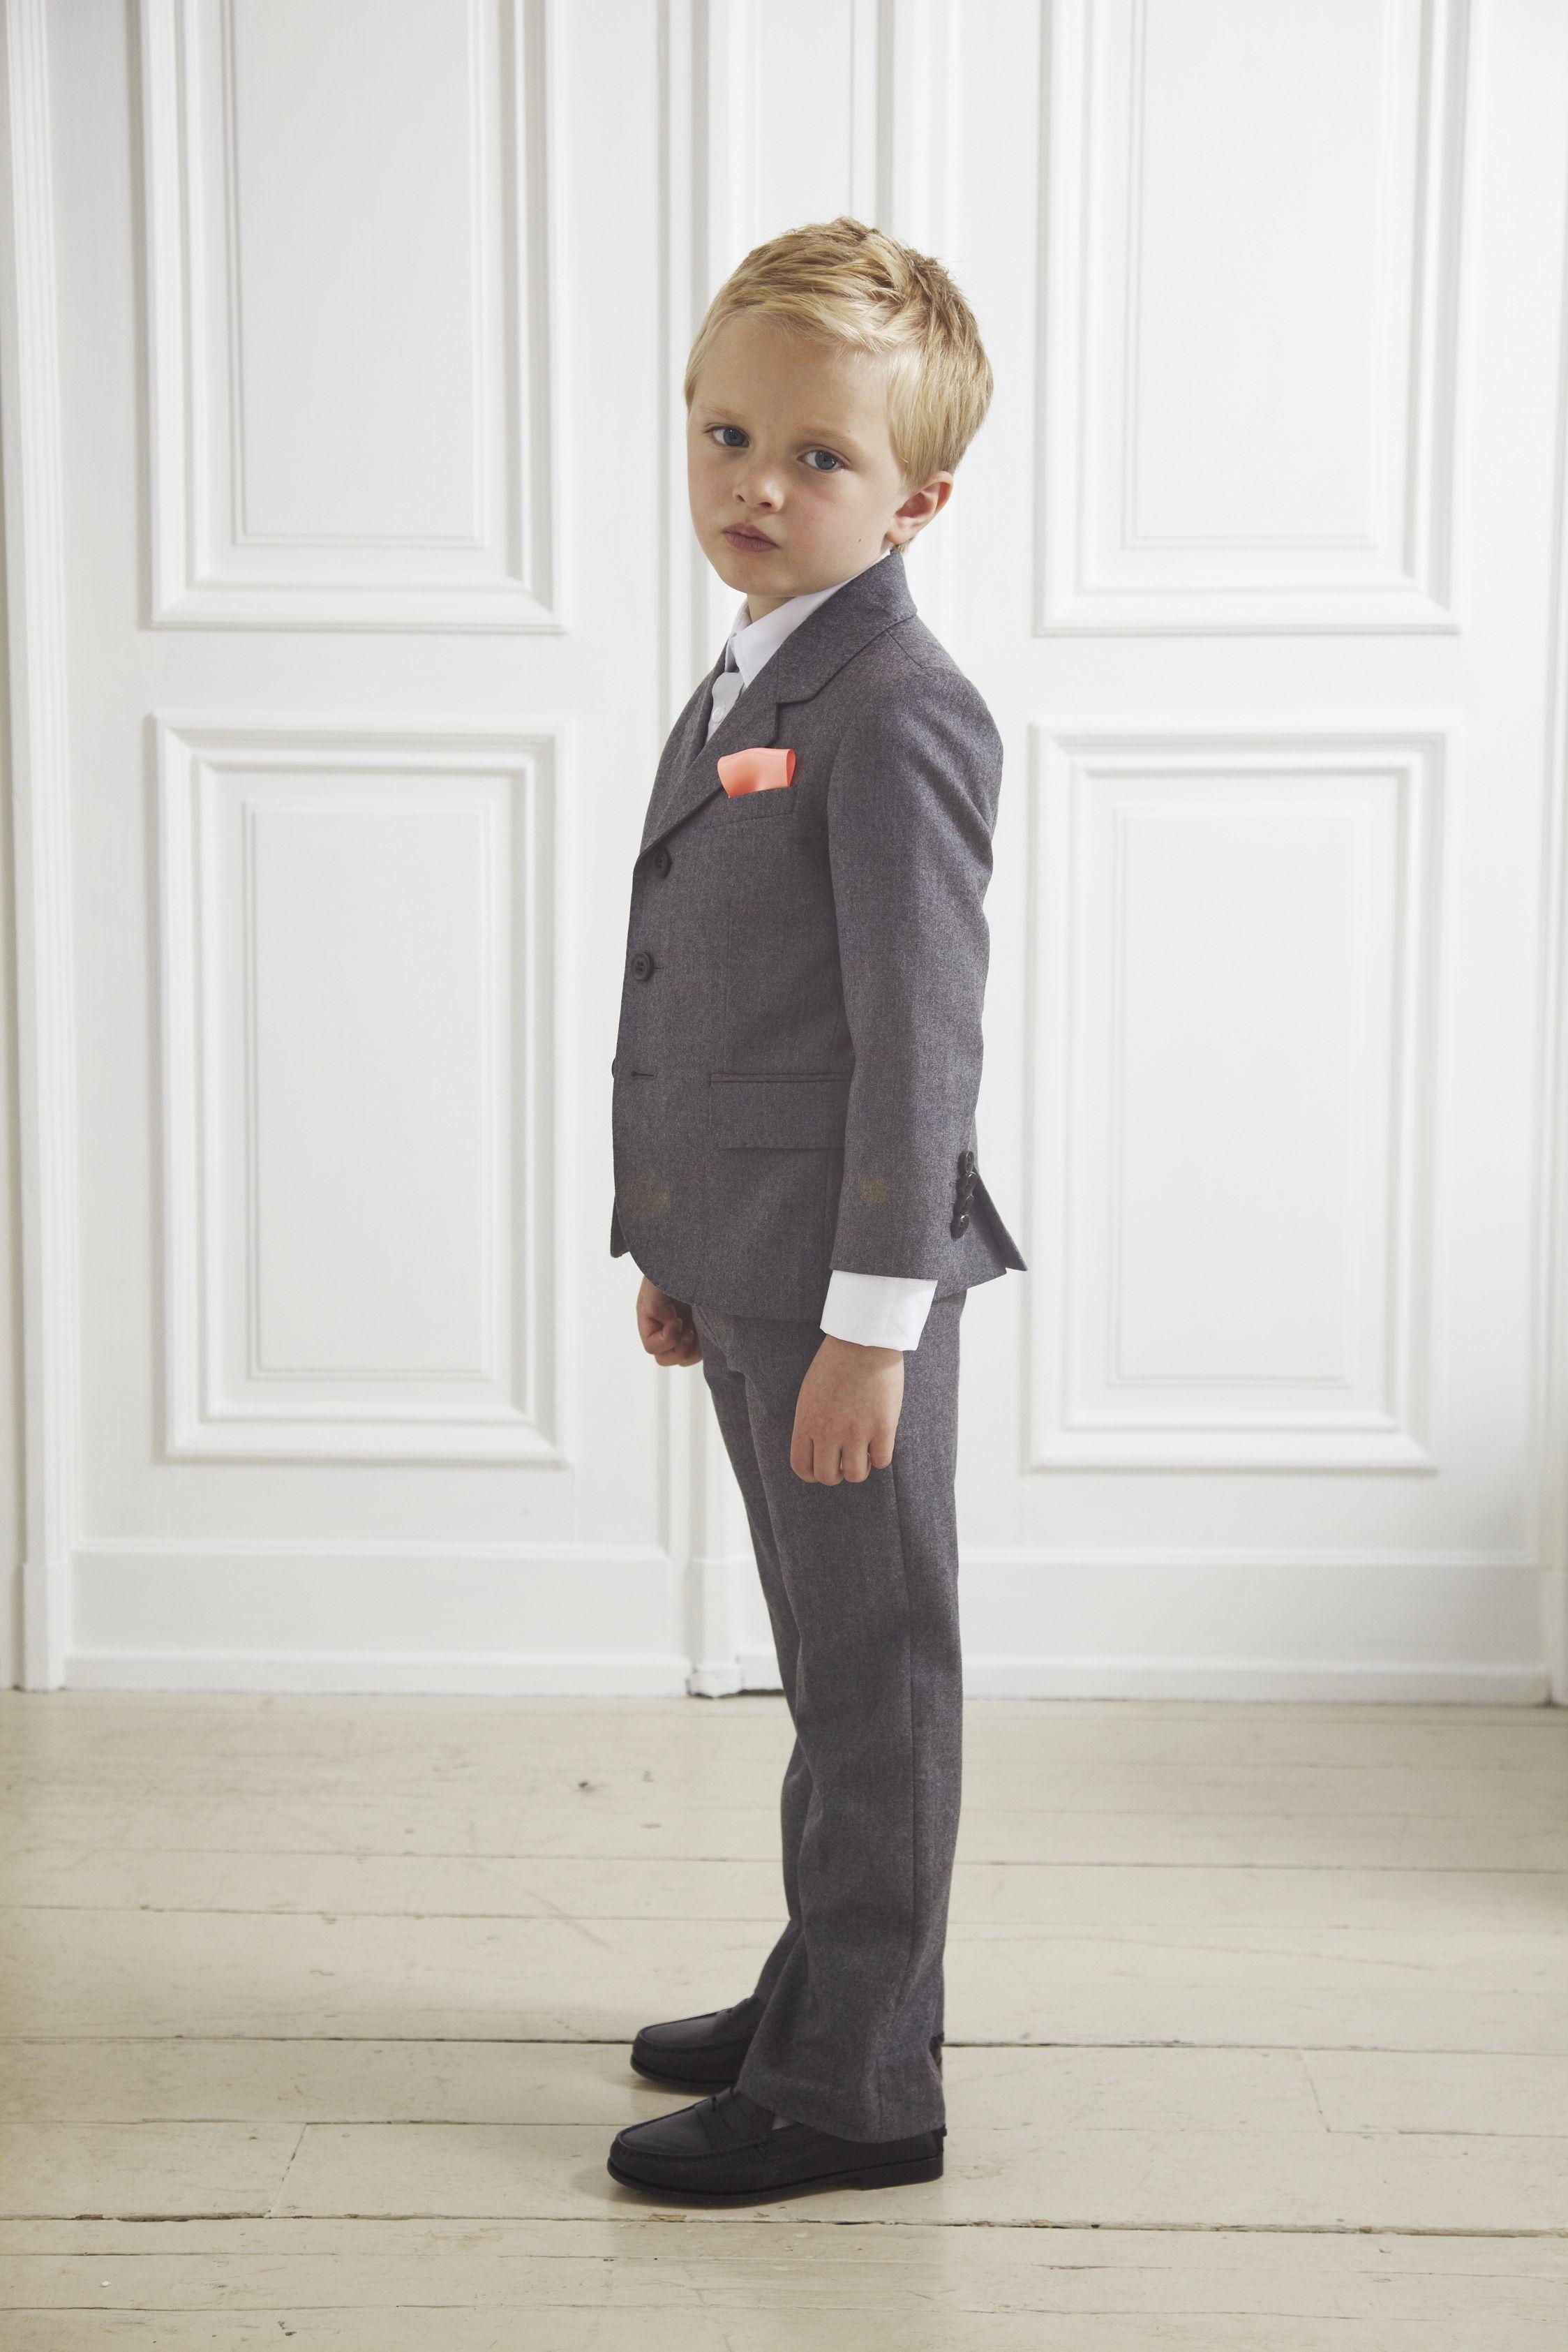 grooms page 1 grey suit weddingwedding